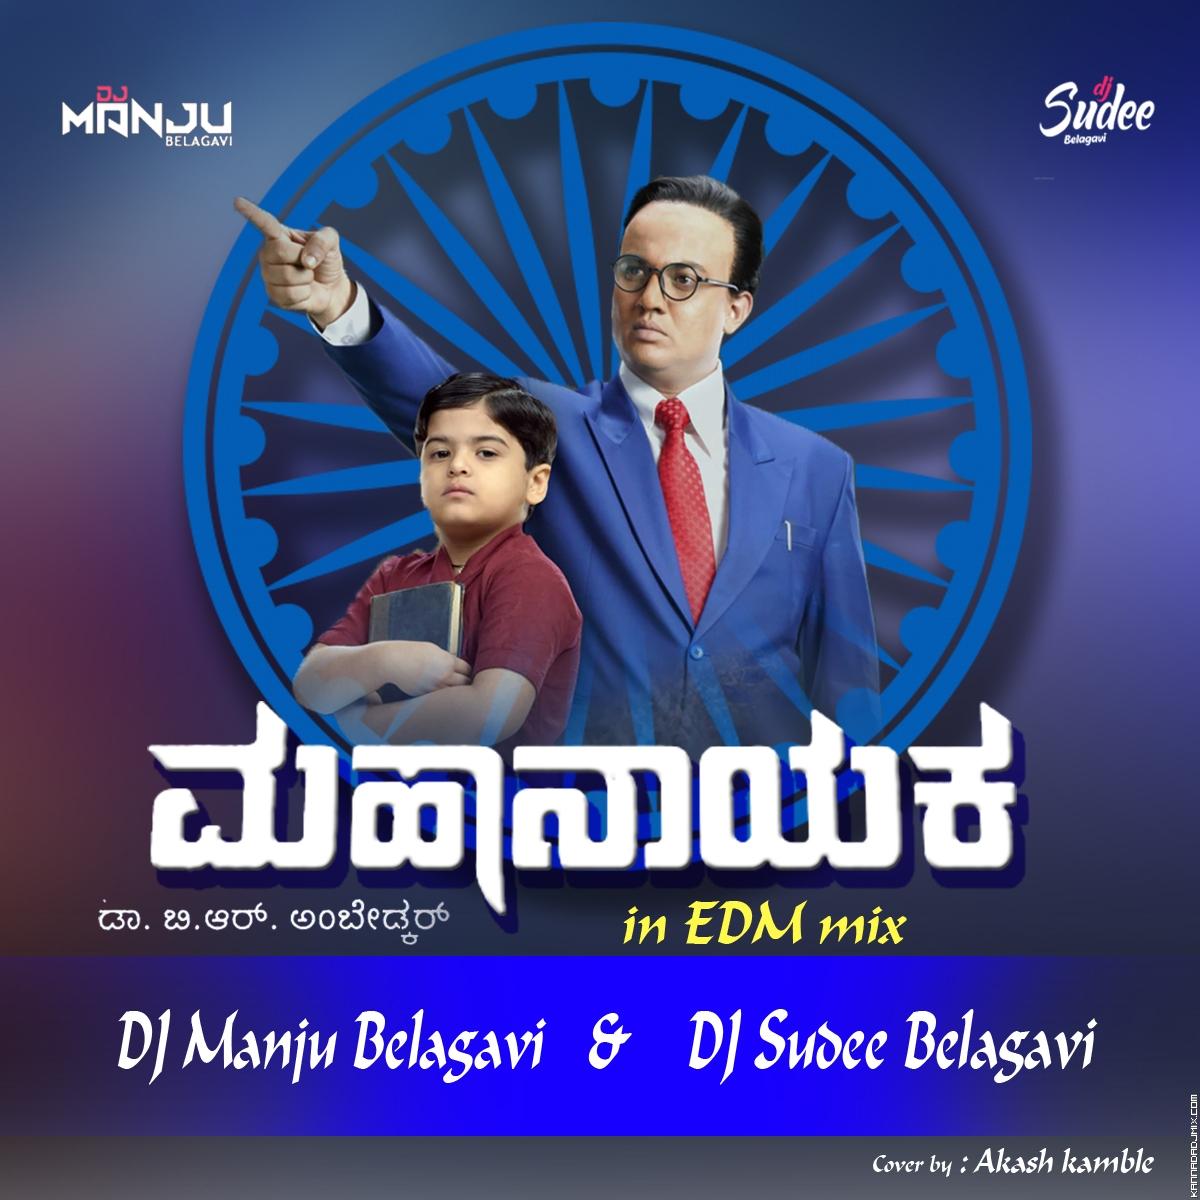 MAHANAYAK In EDM mix Dj Manju Belagavi & Dj Sudee Belagavi.mp3